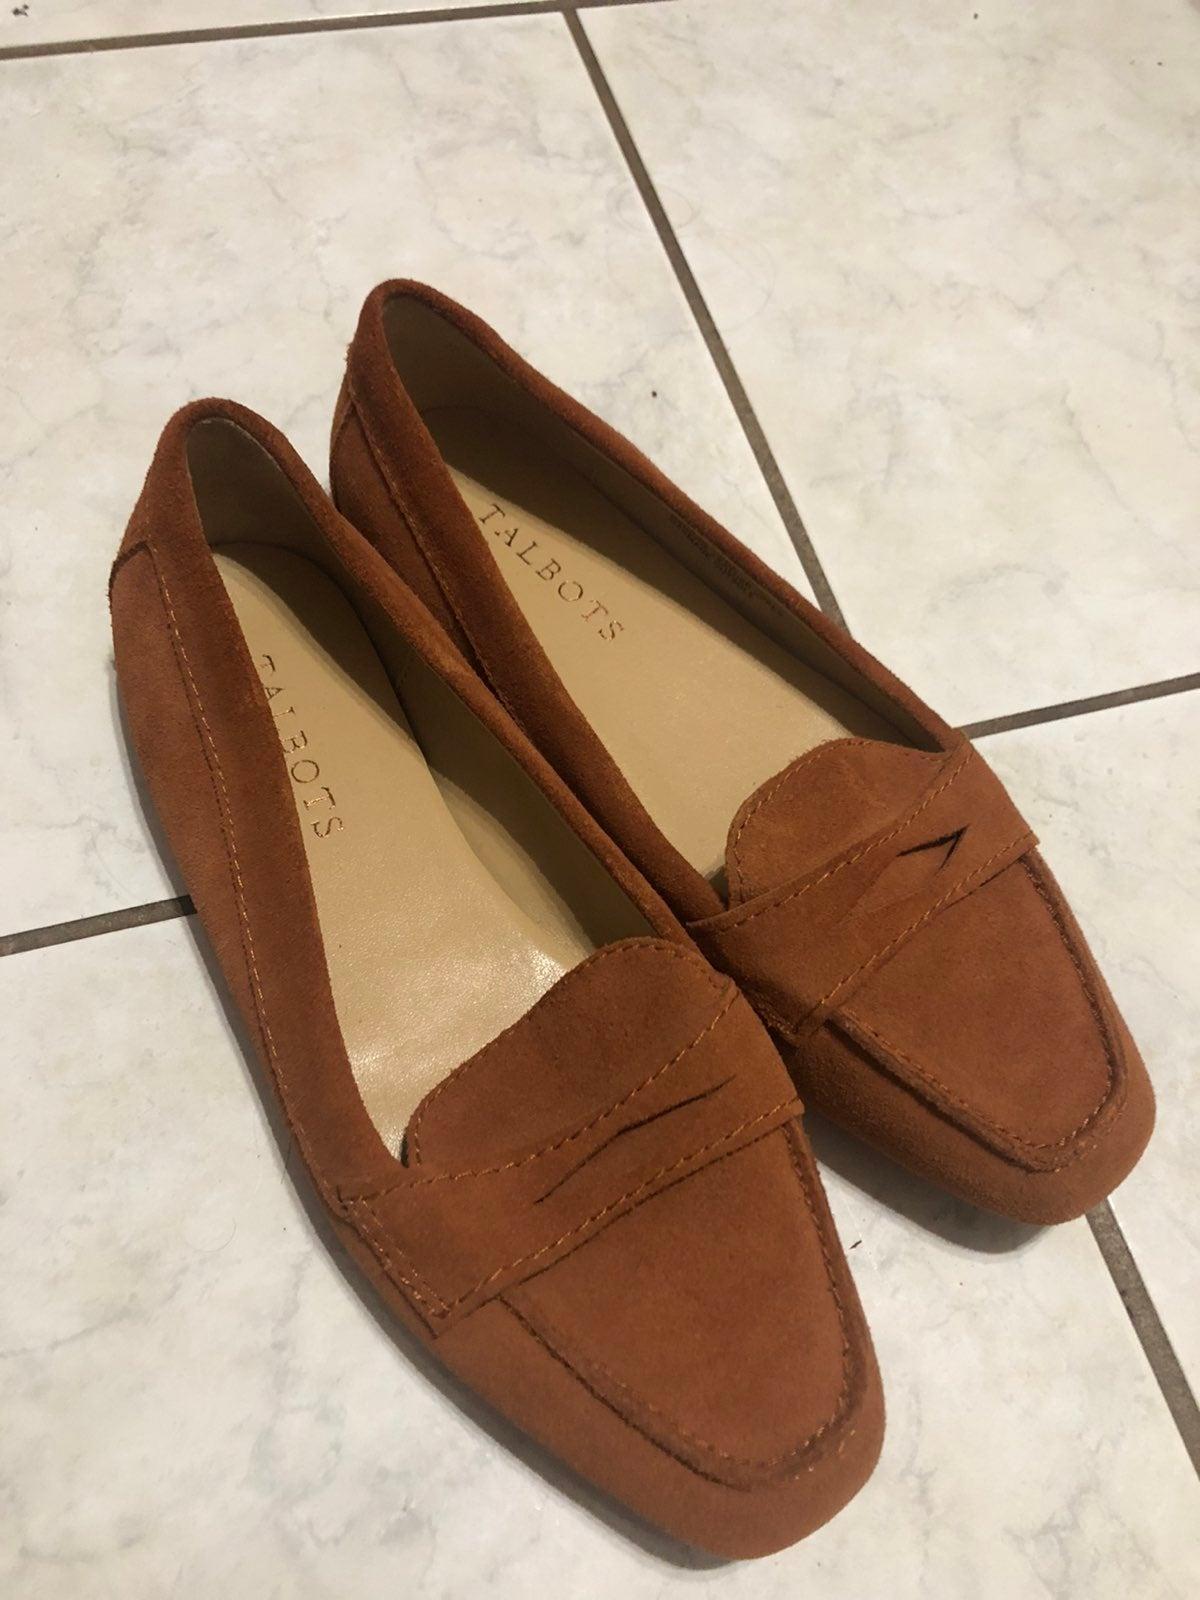 Talbots Slip on Flats Brown Size 6.5